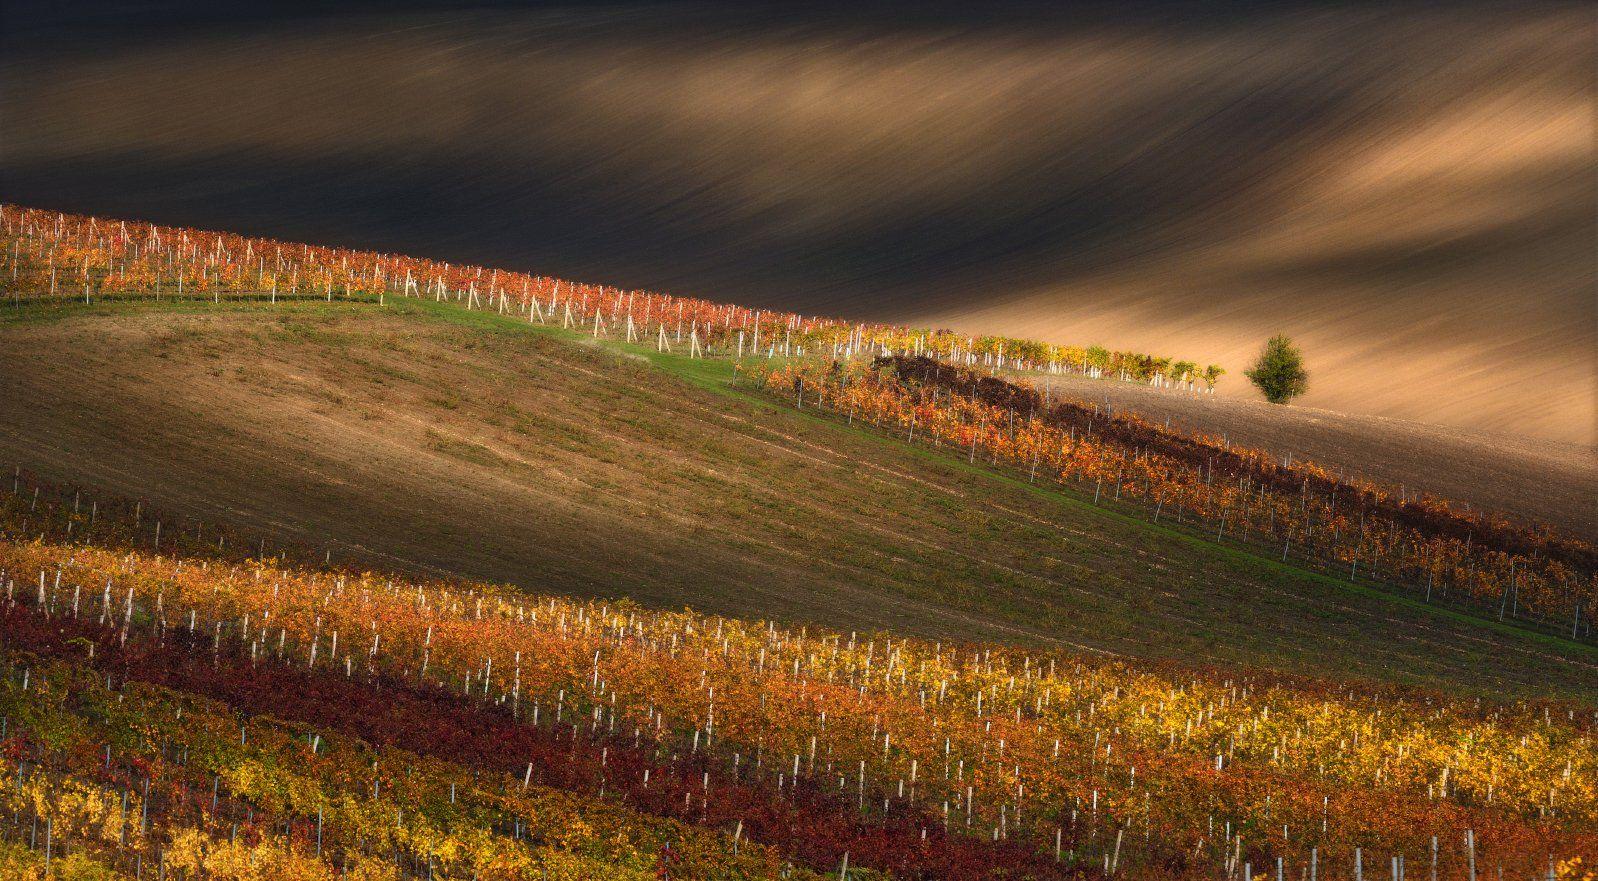 vineyard, grape, south_moravia, morava, czech, autumn, moravian, vine, vineyard_lines, line, wine, чехия, южная моравия, south moravian, вино, виноград, осень, Влад Соколовский